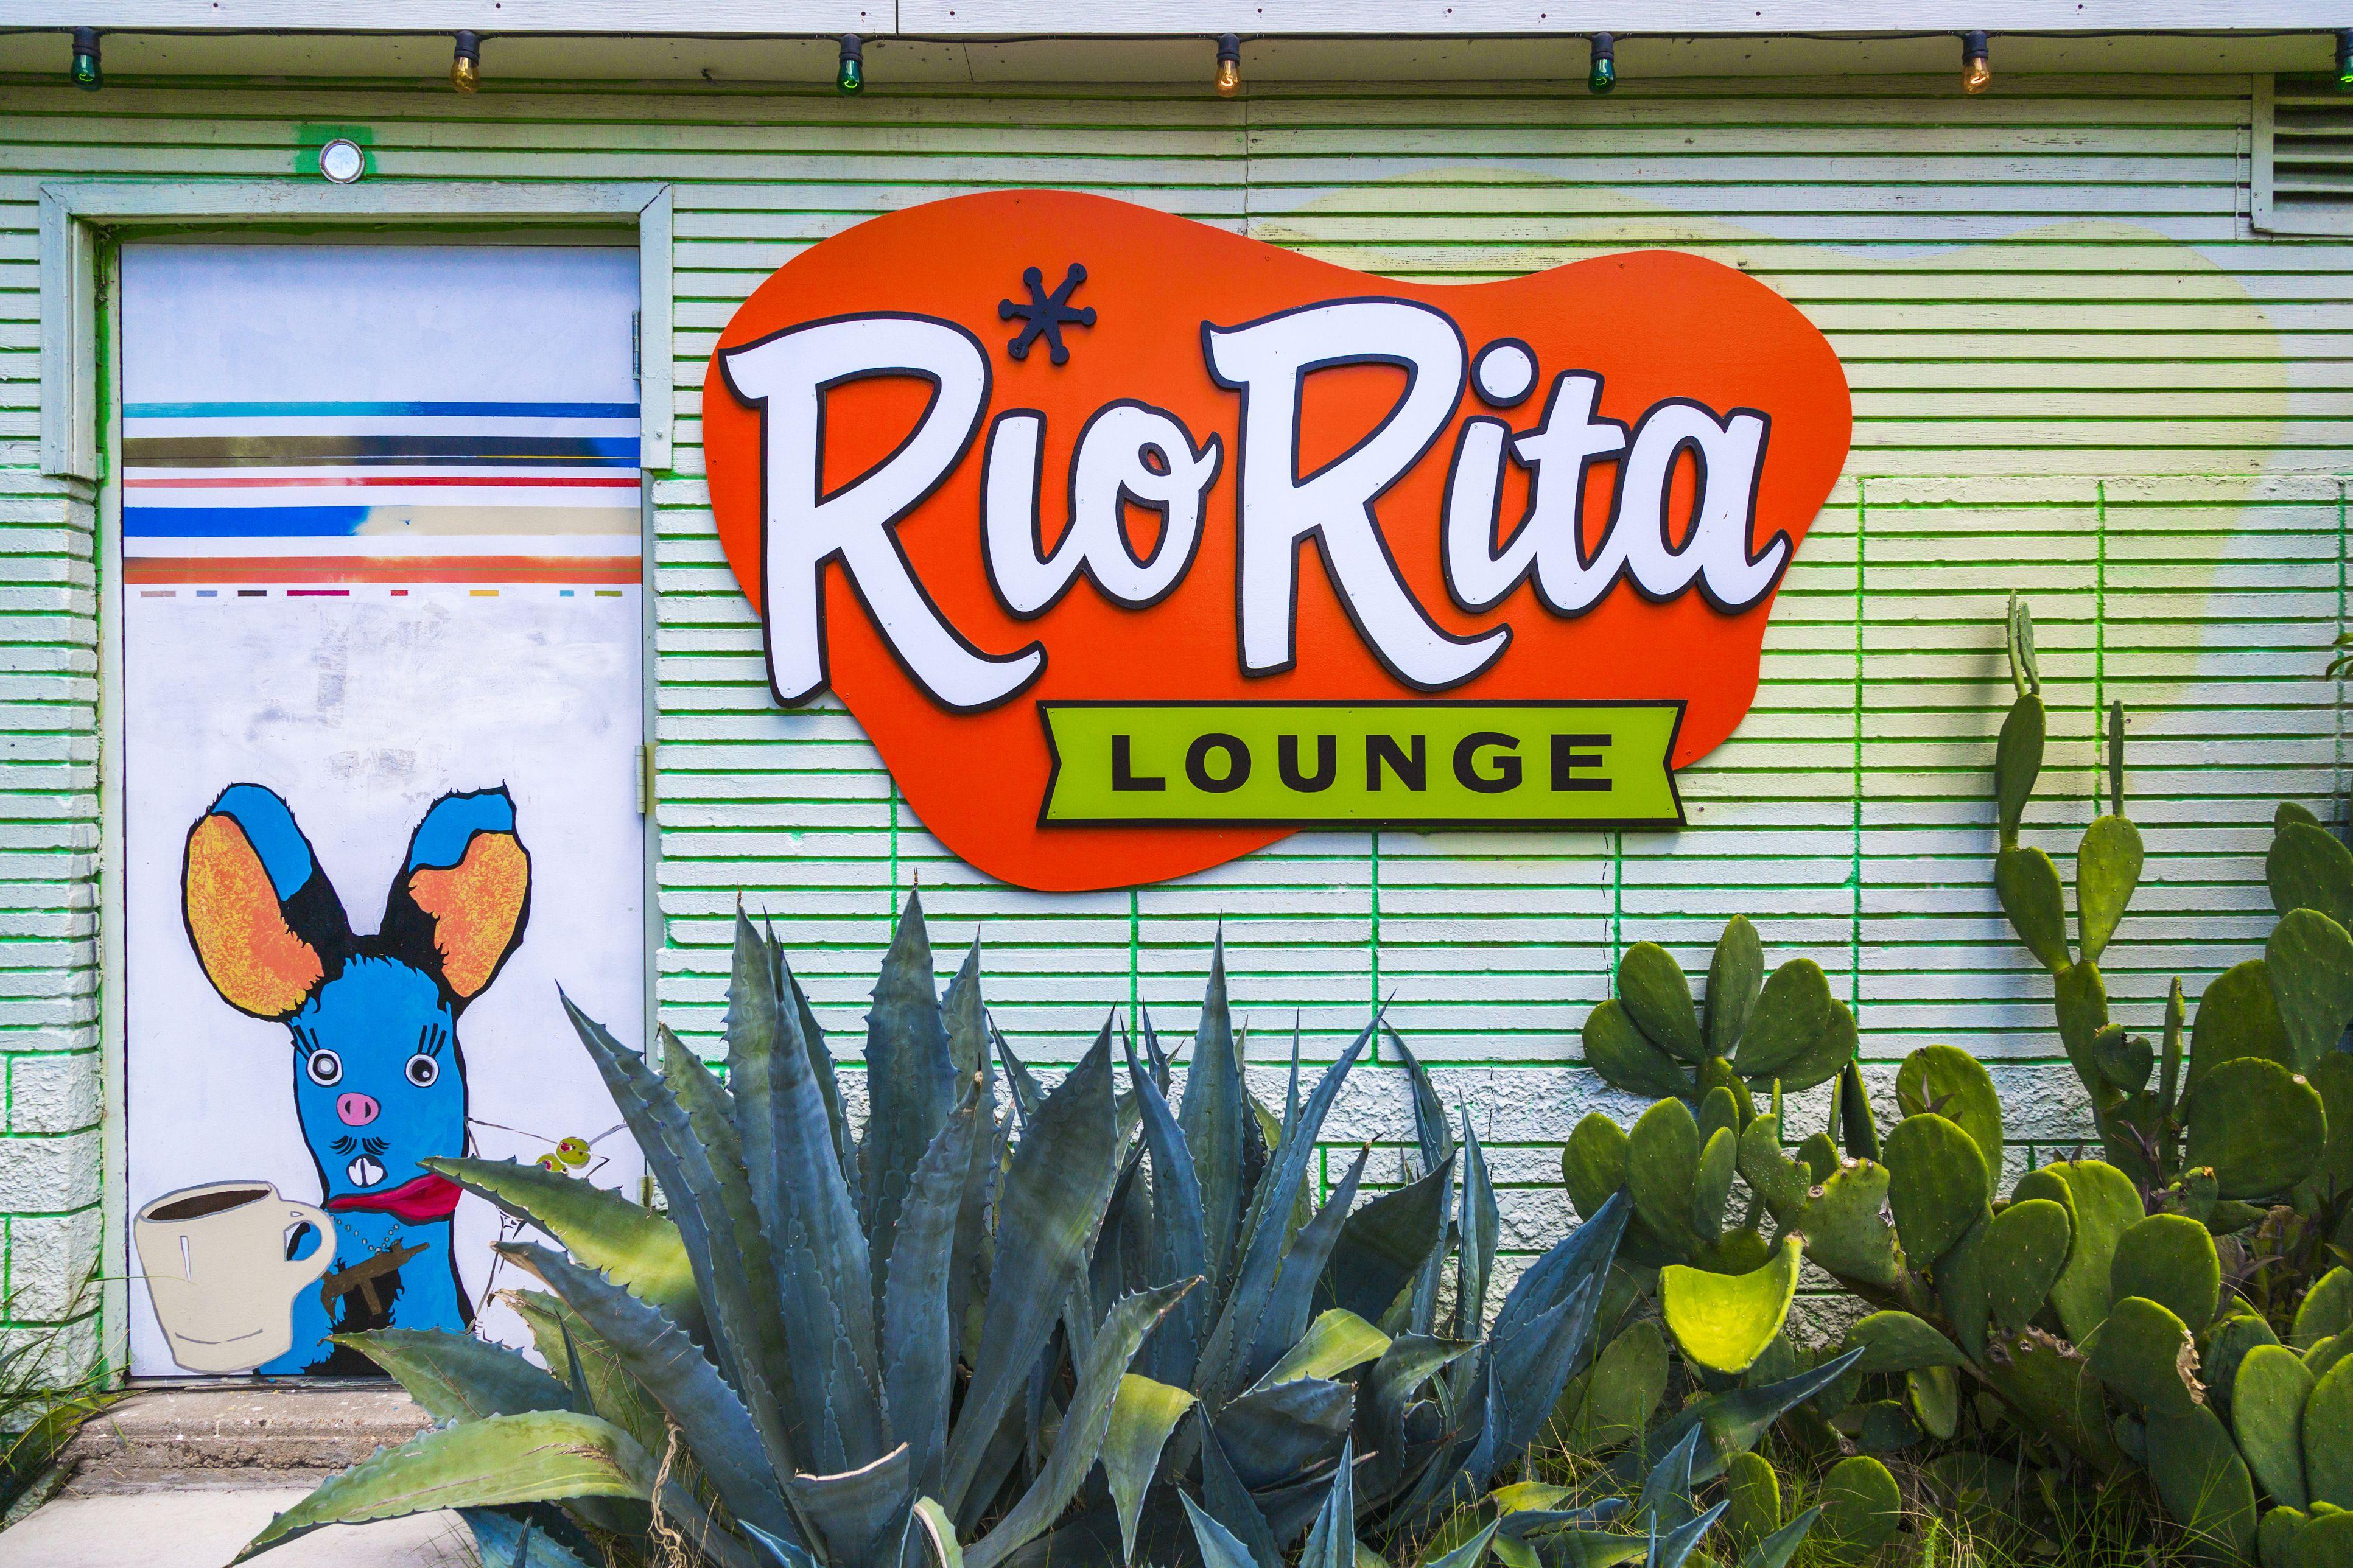 Retro lounge in East Austin